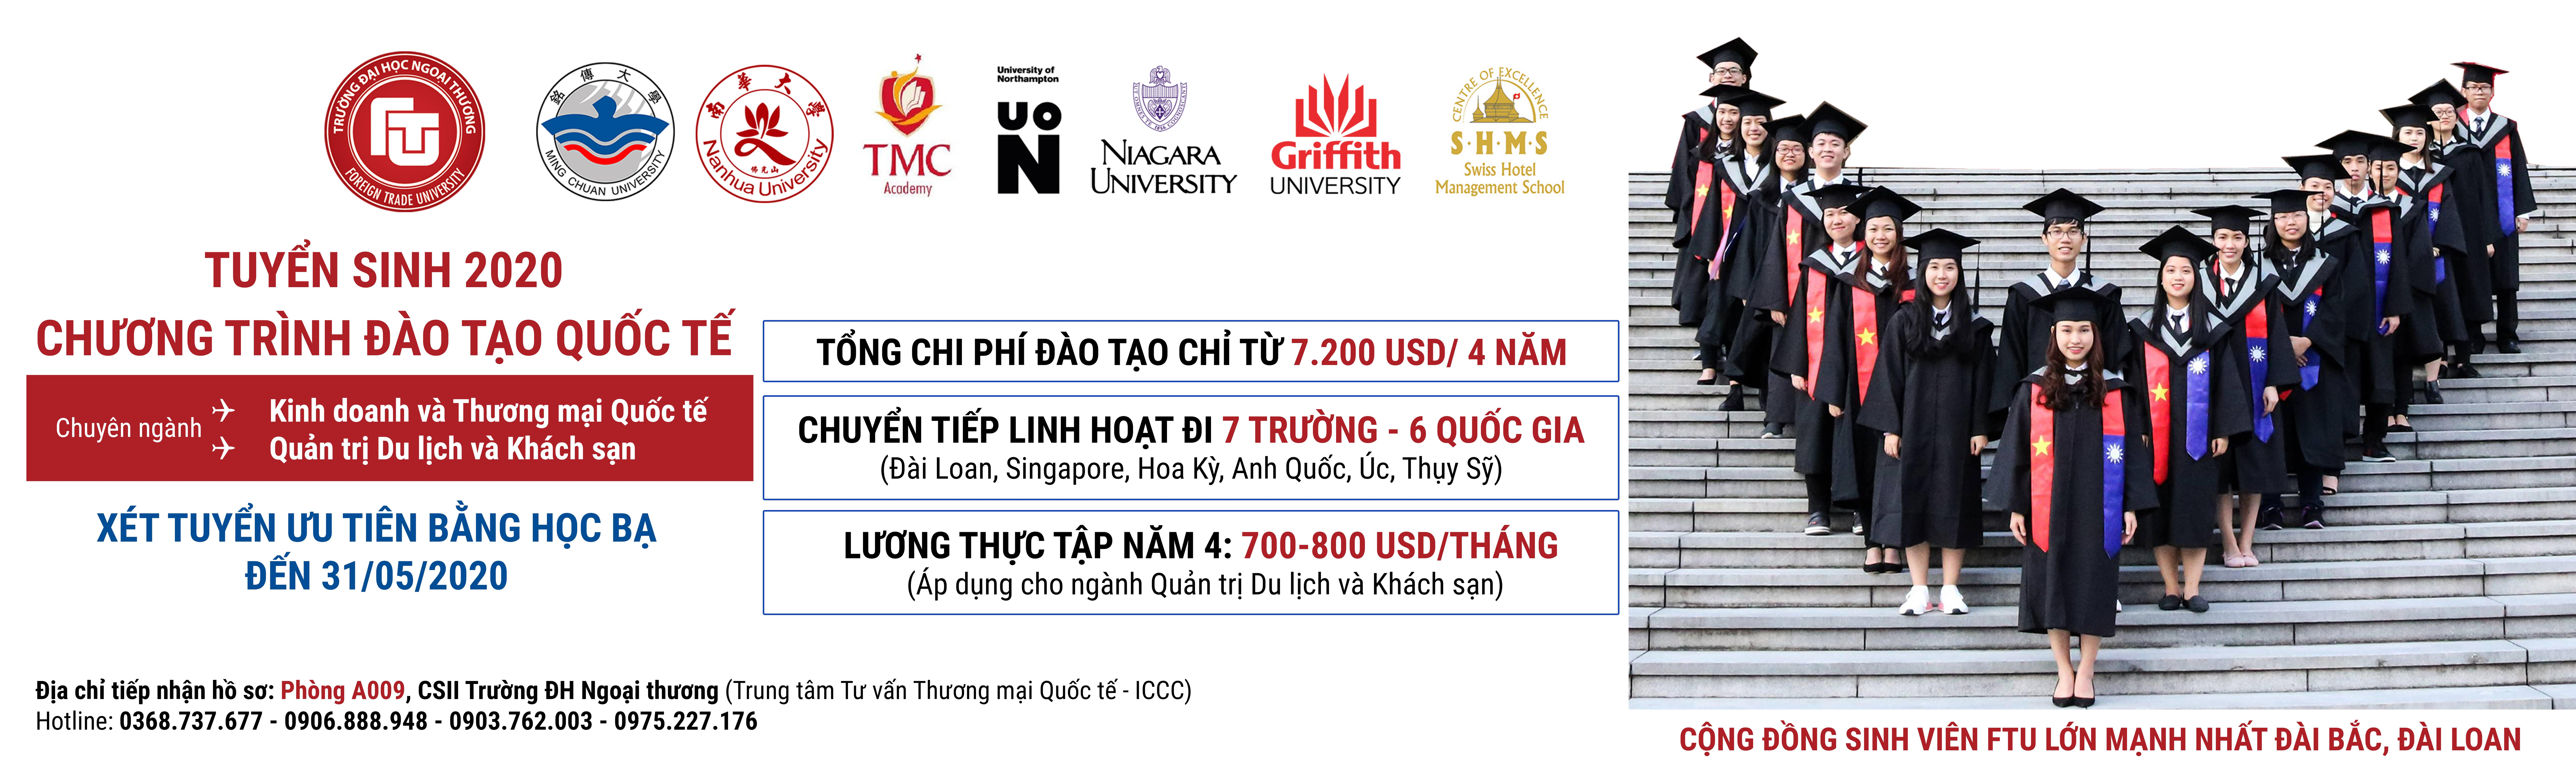 http://icccftu.vn/thong-bao-xet-tuyen-22